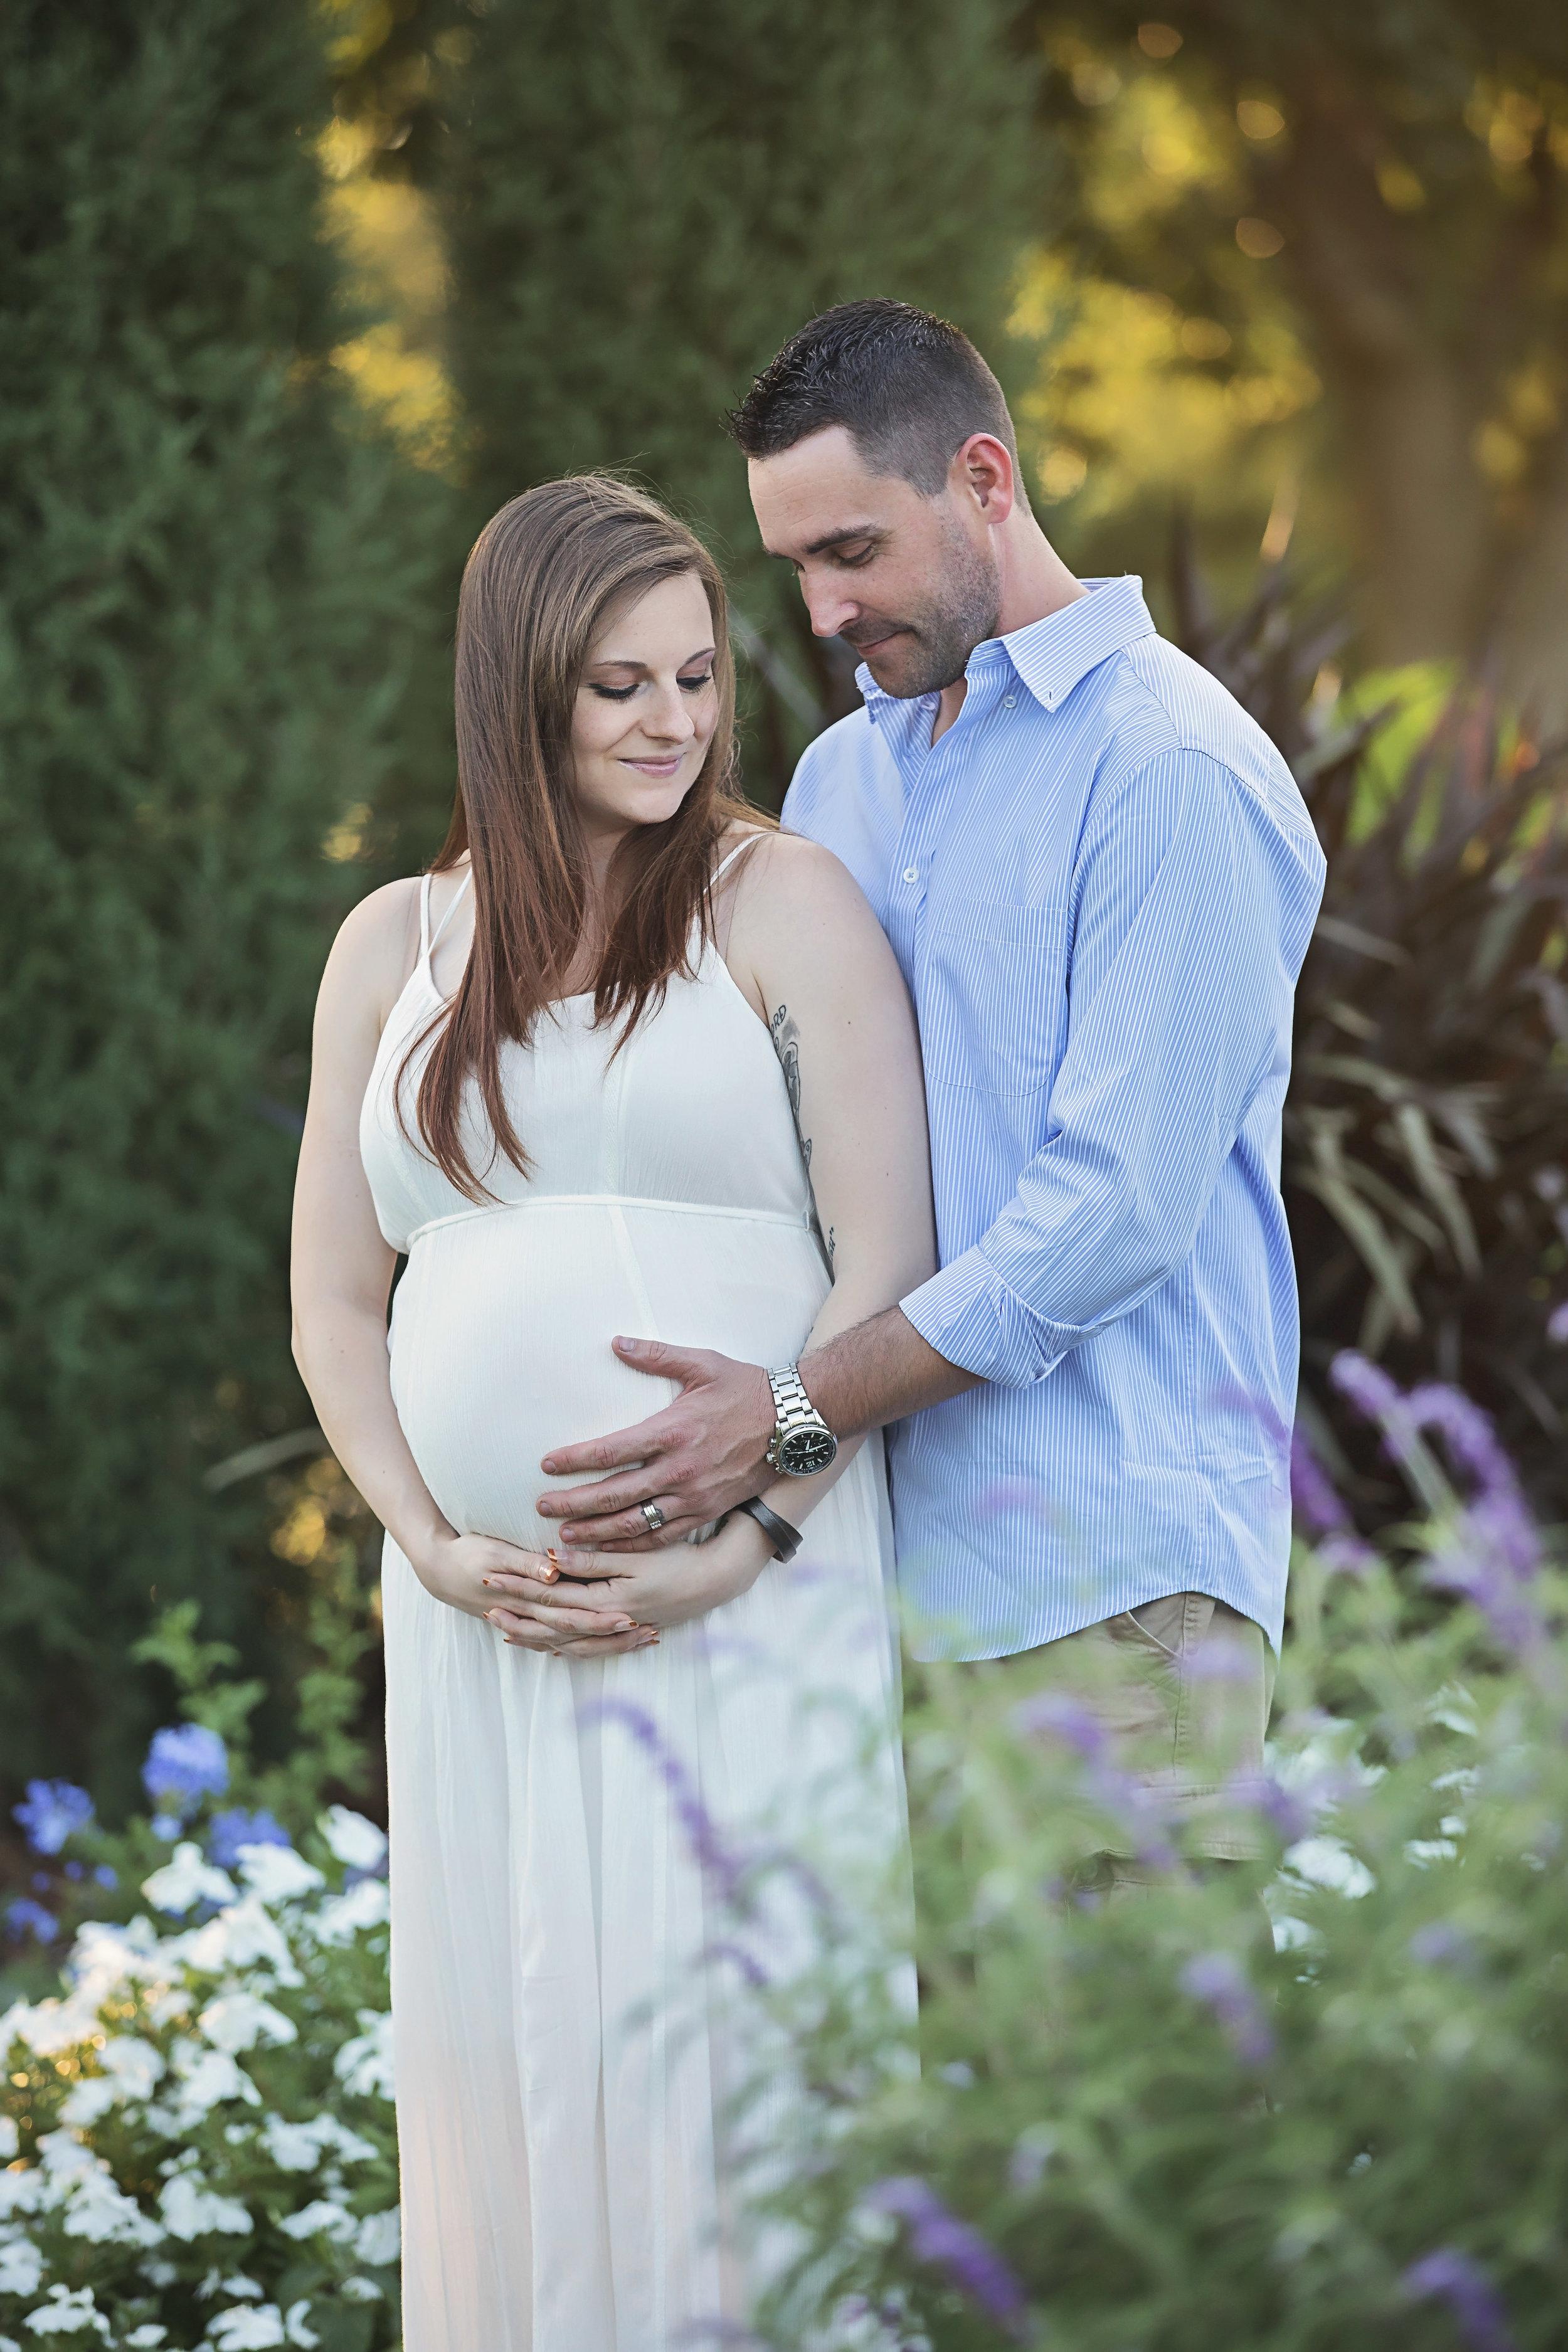 Maternity photoshoot at Will Rogers Park in Oklahoma City by Amanda Lynn Photography.